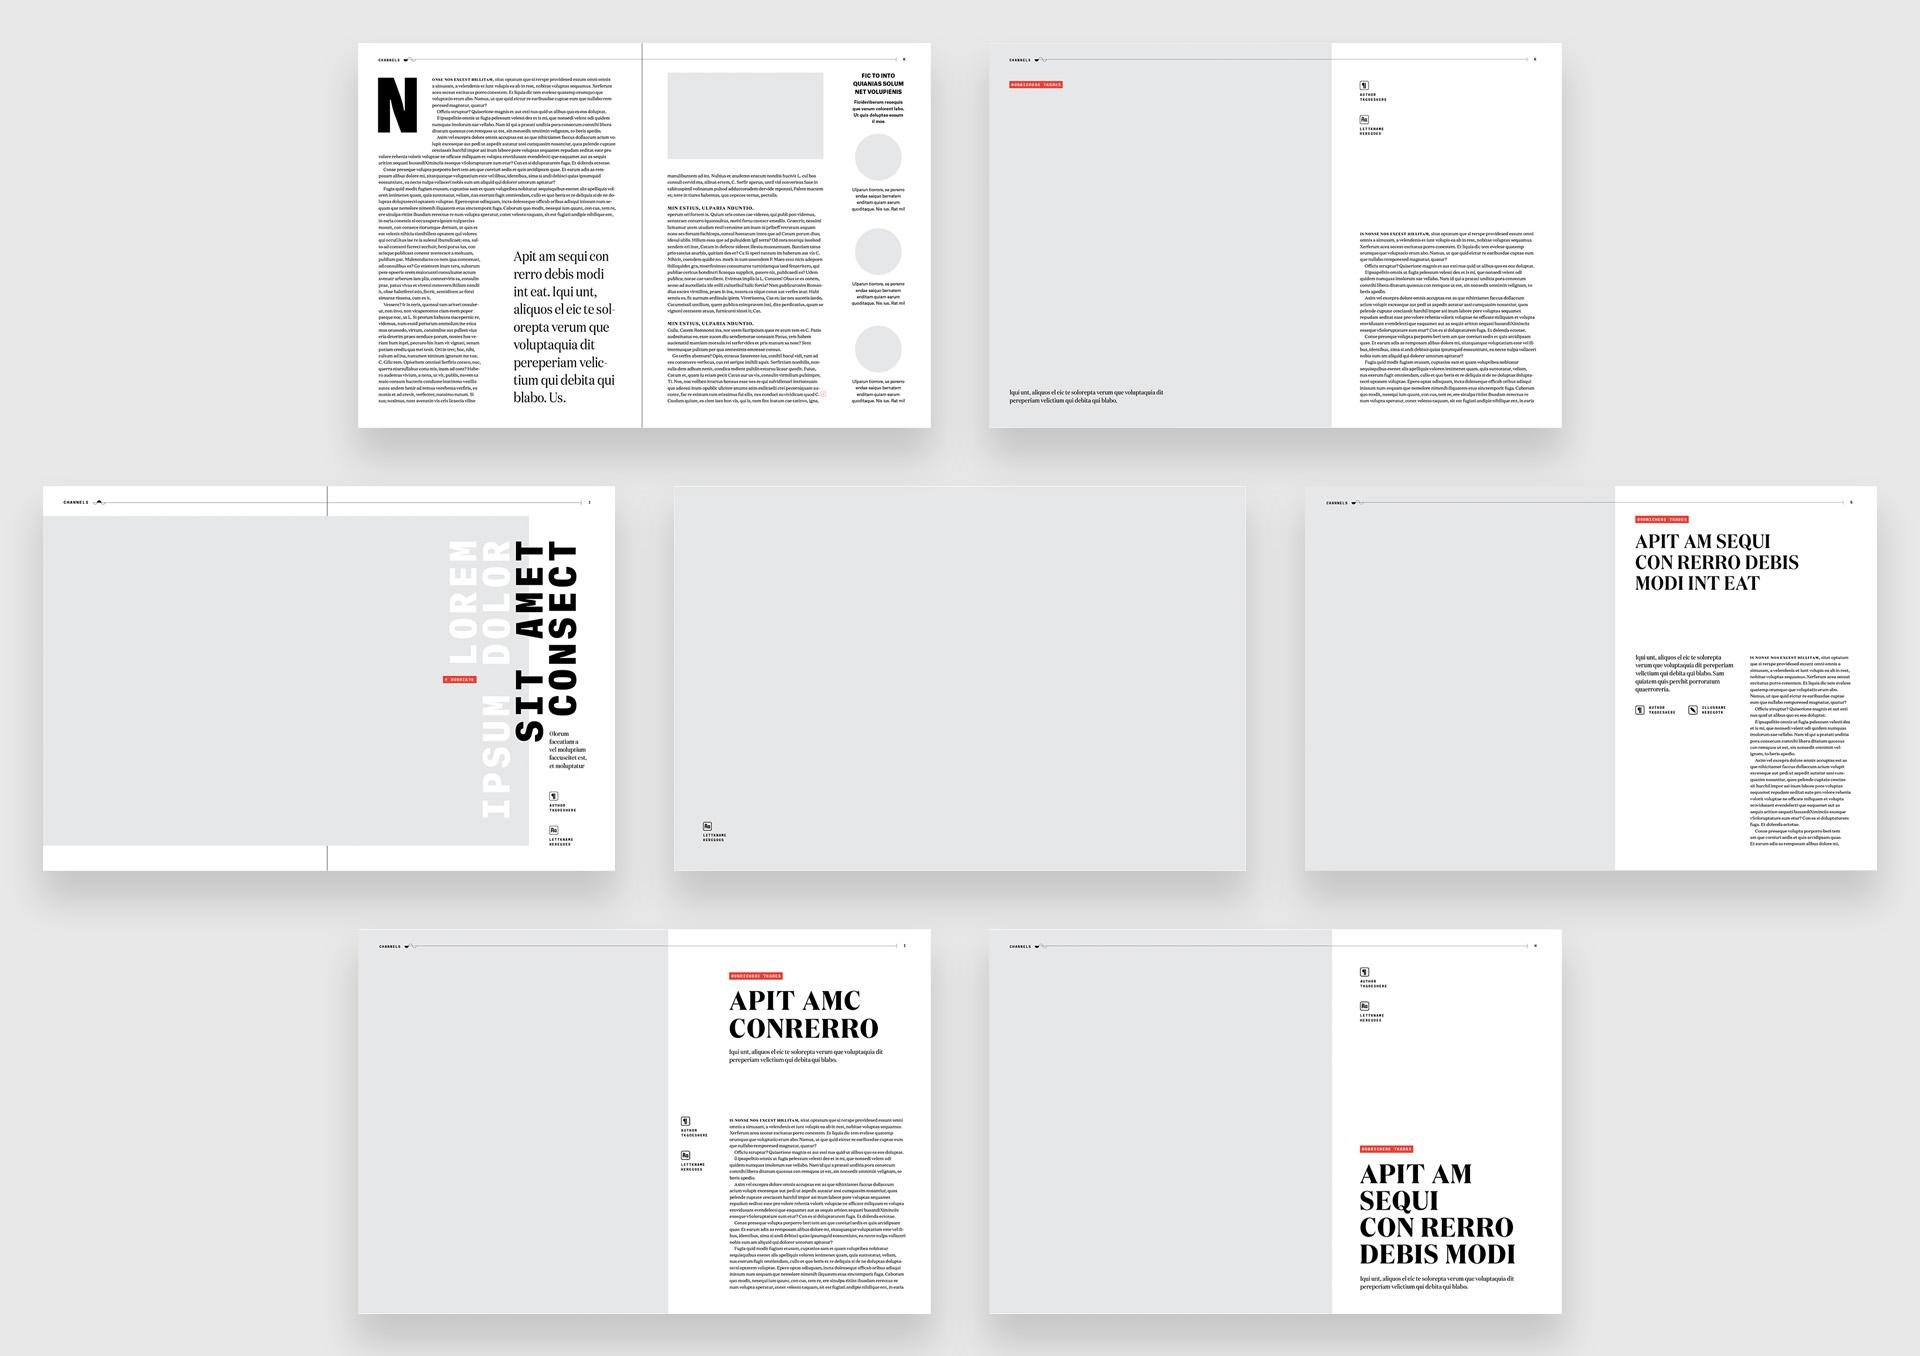 Magazine templates and layout design options for Slack's Channels publication.